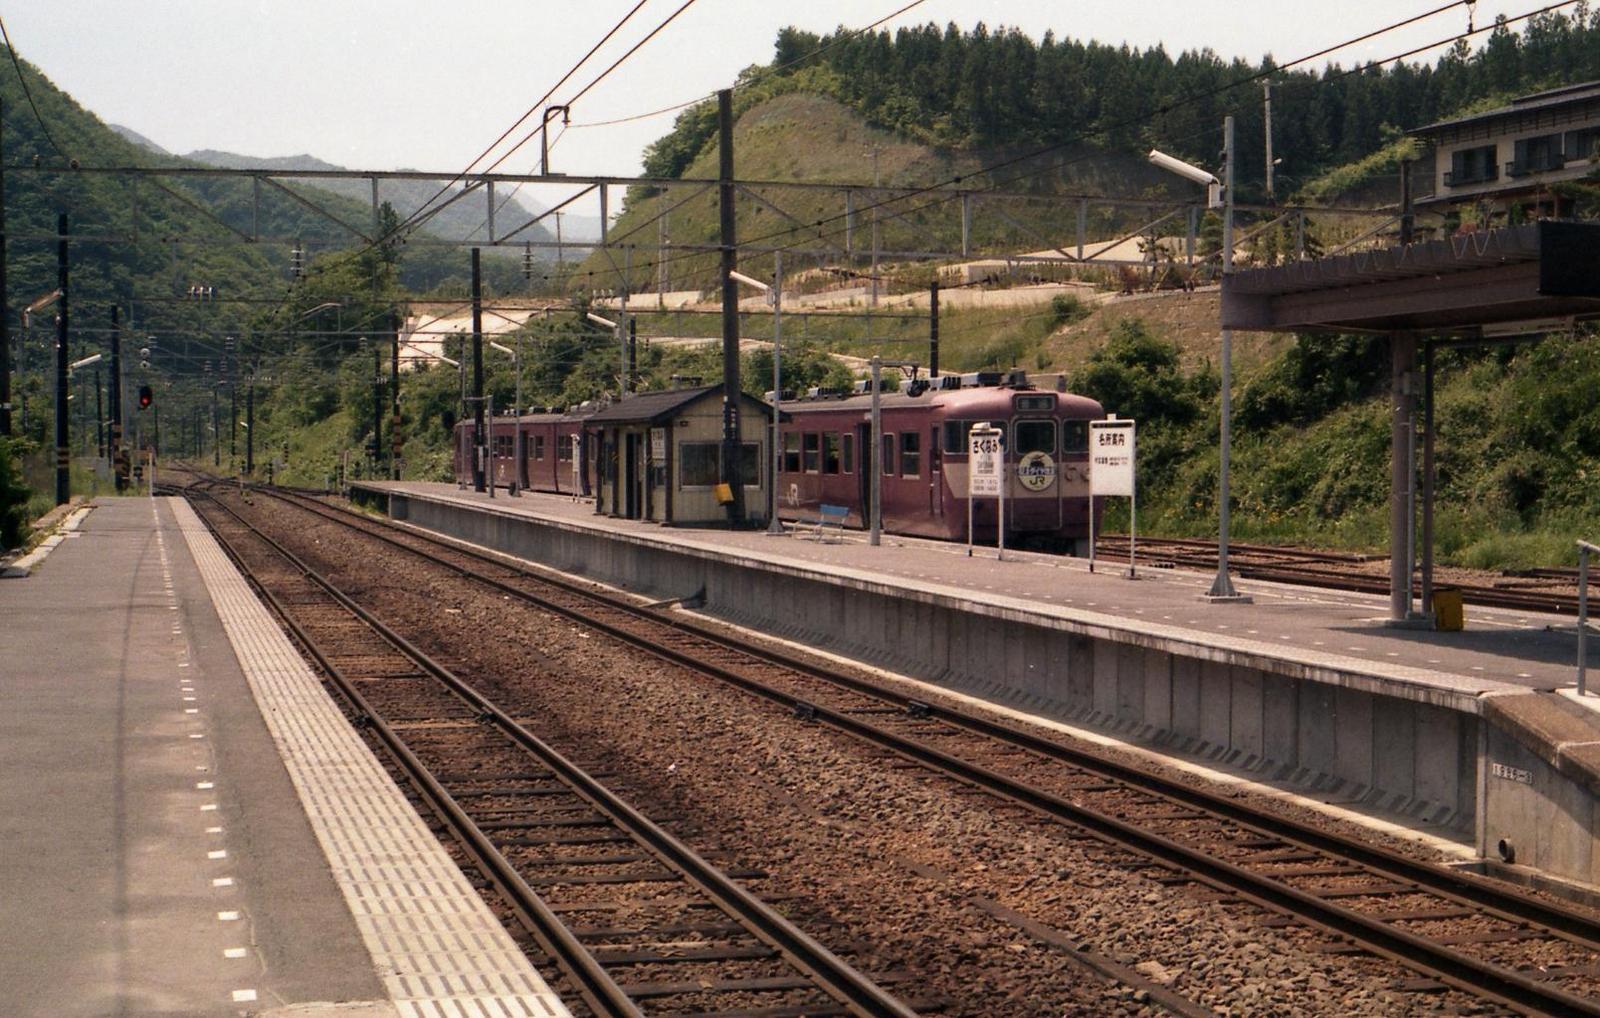 19870606a01